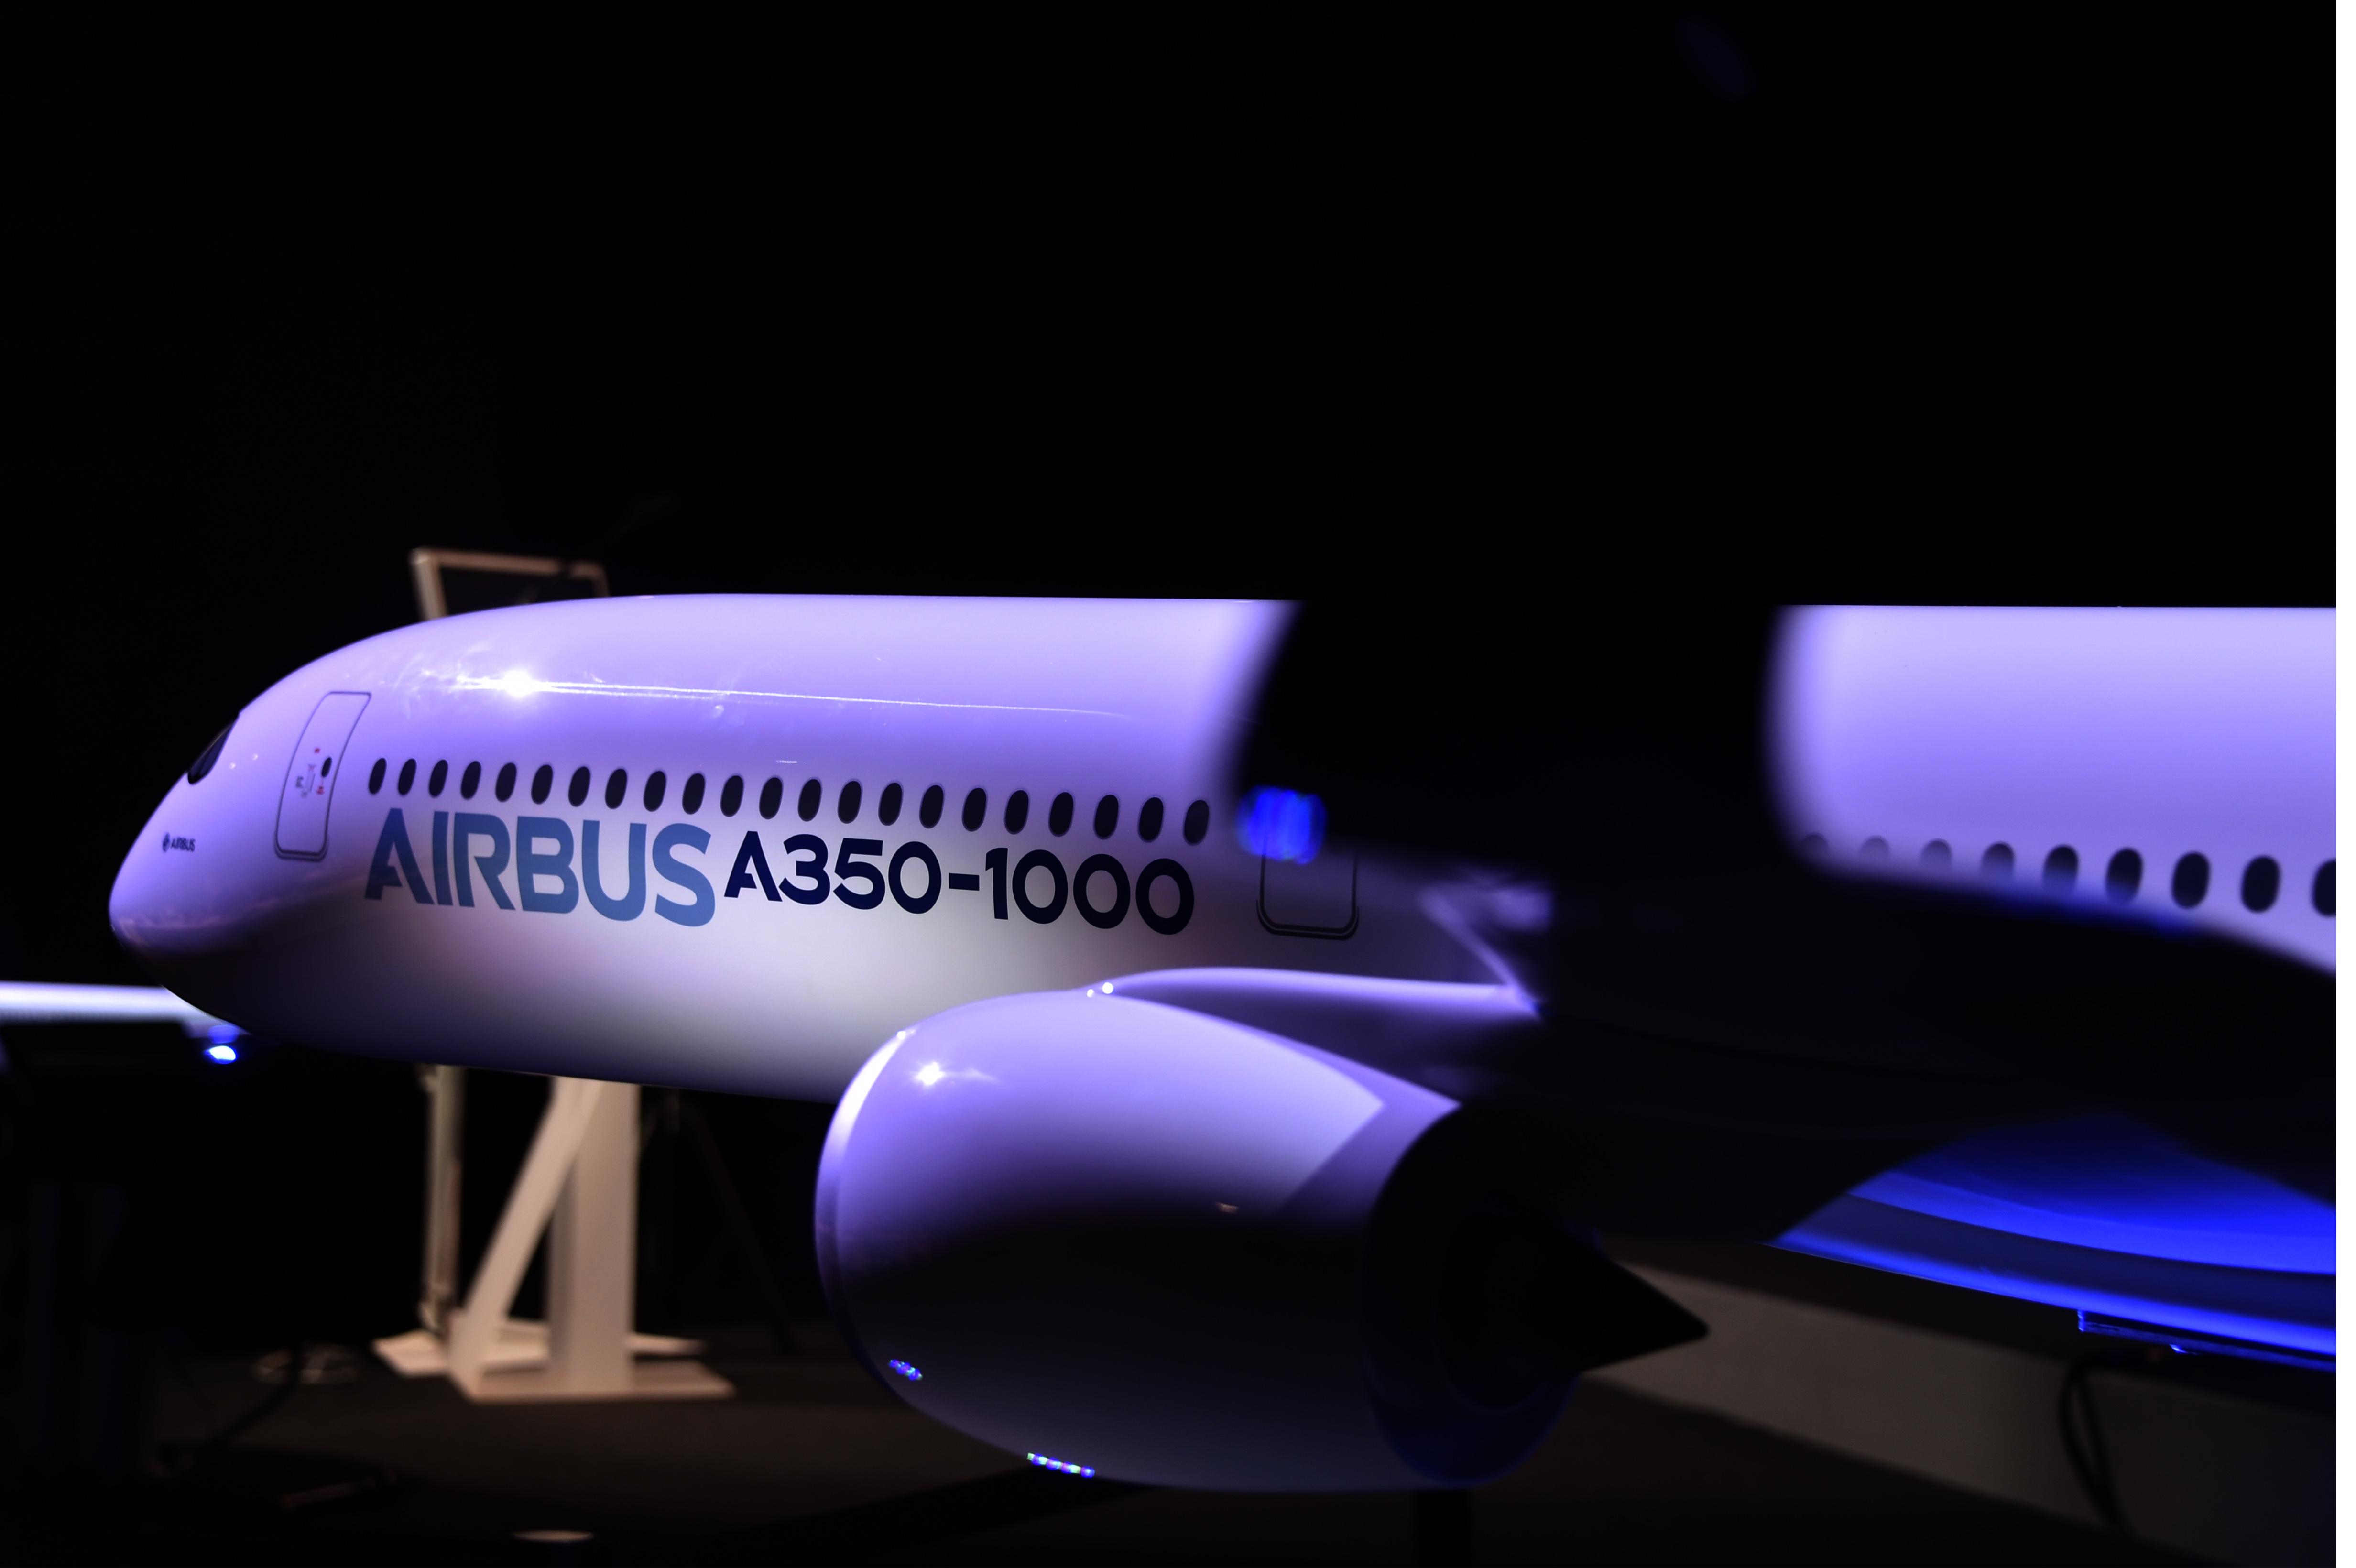 FRANCE-AIRBUS-AIRCRAFT-A350